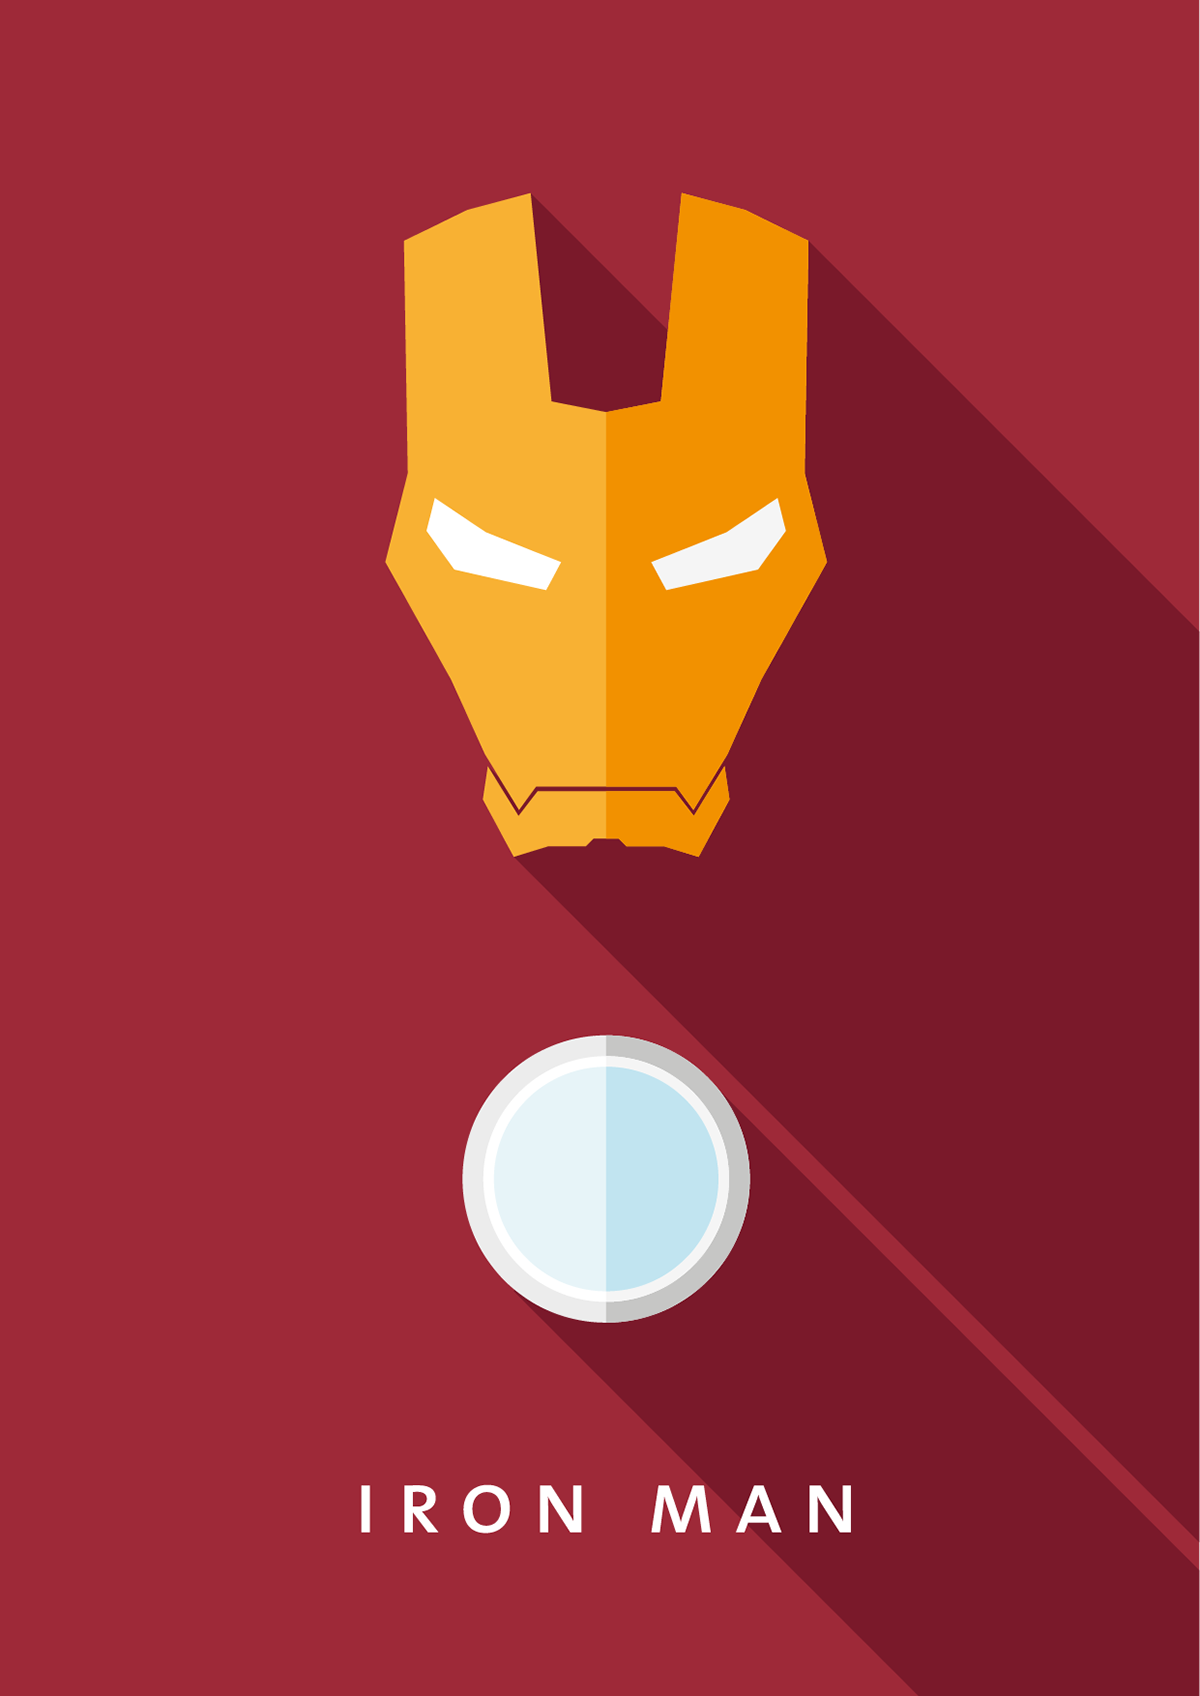 Marvel Character Design Behance : Minimalistic flat design comic hero poster on behance